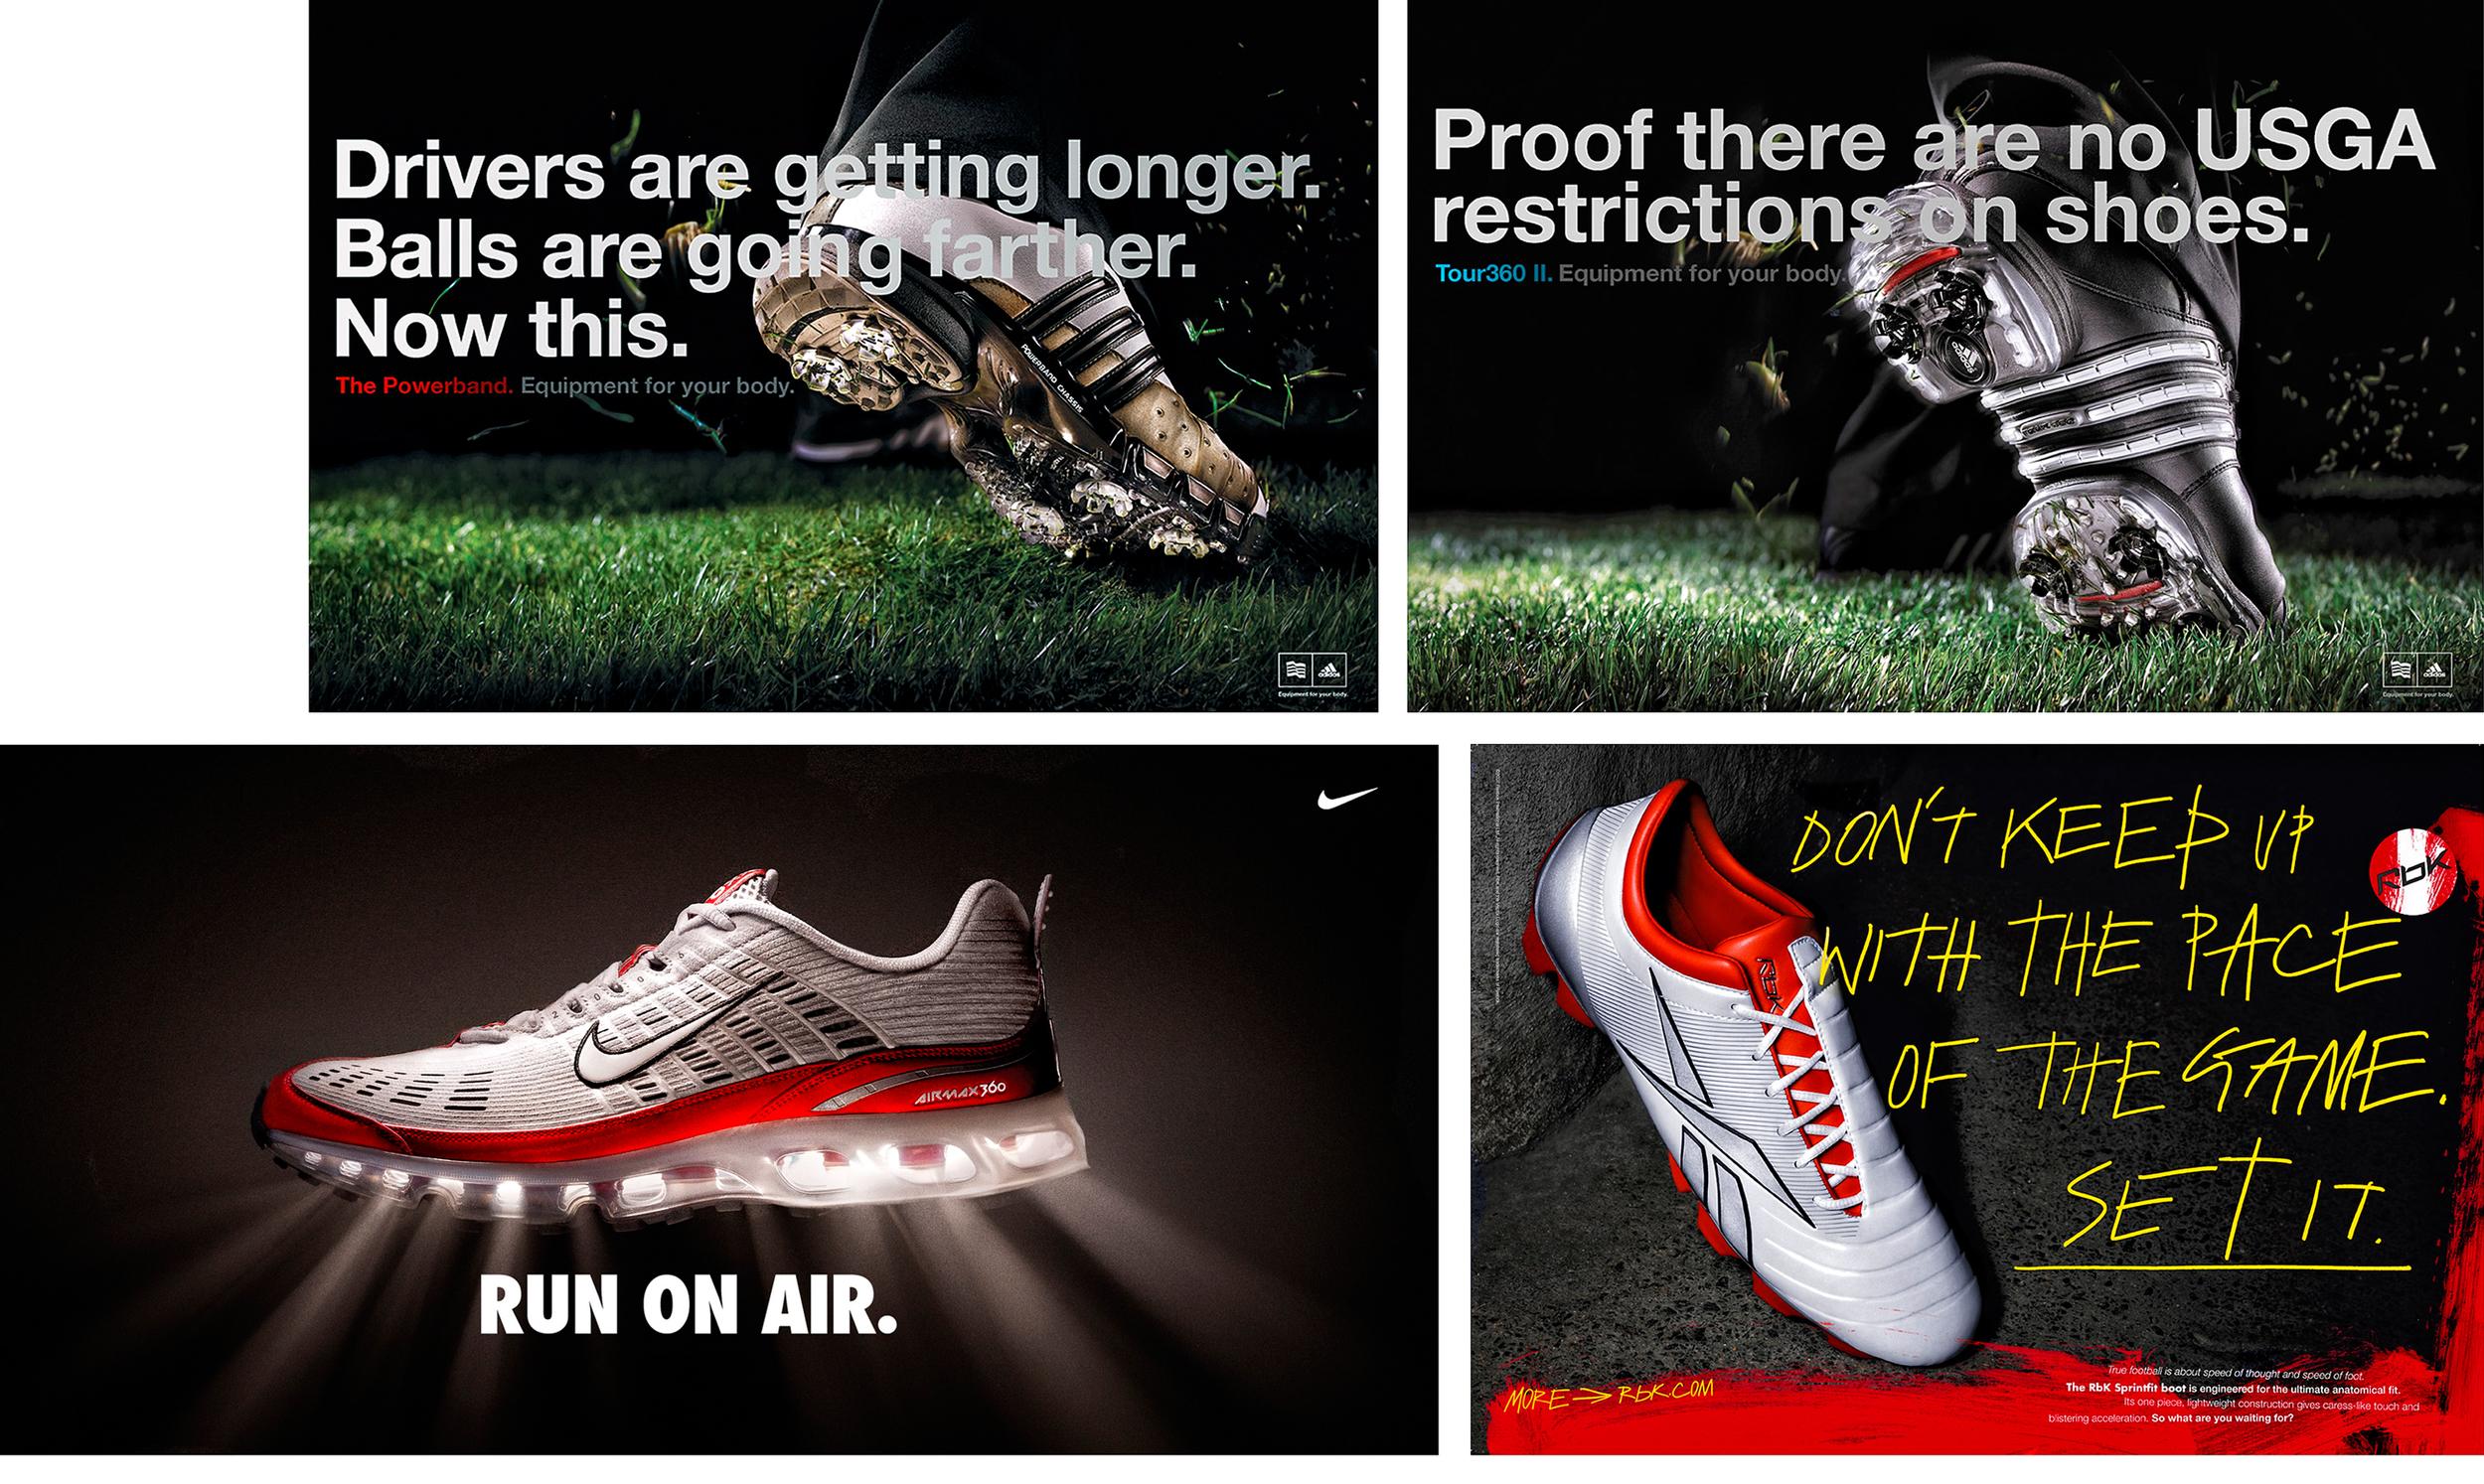 Adidas; TBWA Chiat Day -Nike; Soul Nitro - Reebok; Leagas Delaney